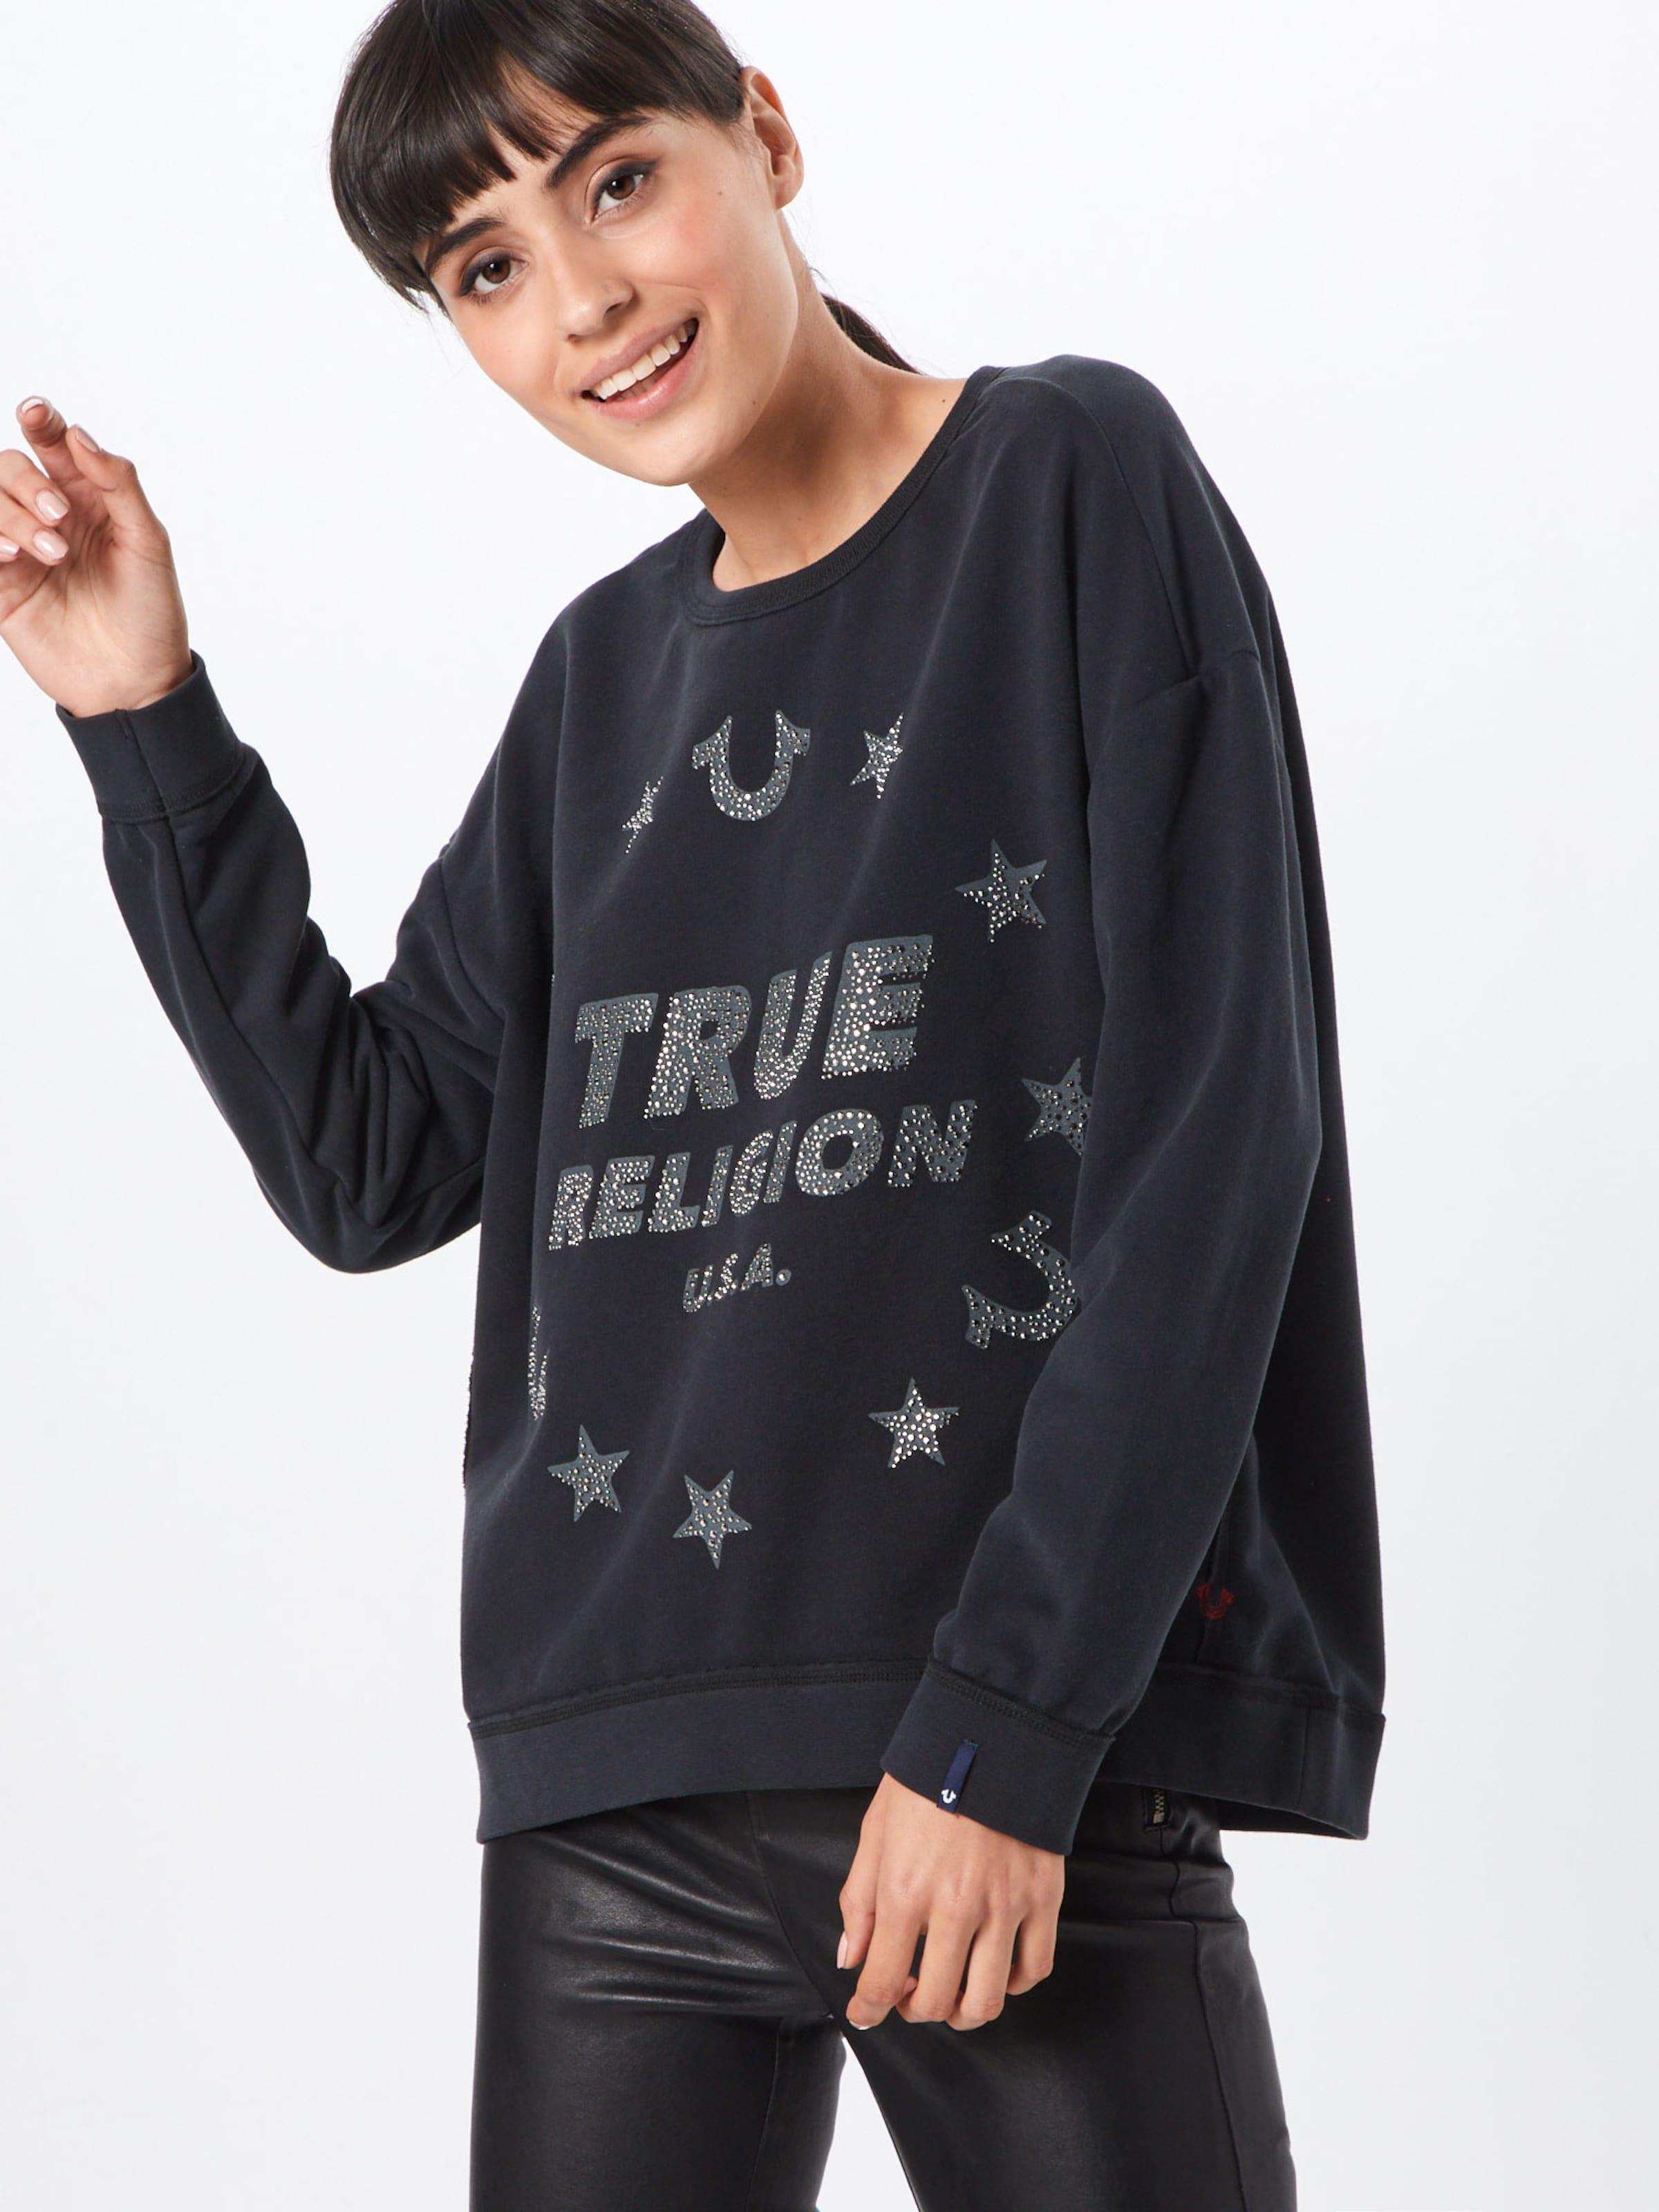 shirt Religion Noir En True 'stars' Sweat Ov0N8nwm